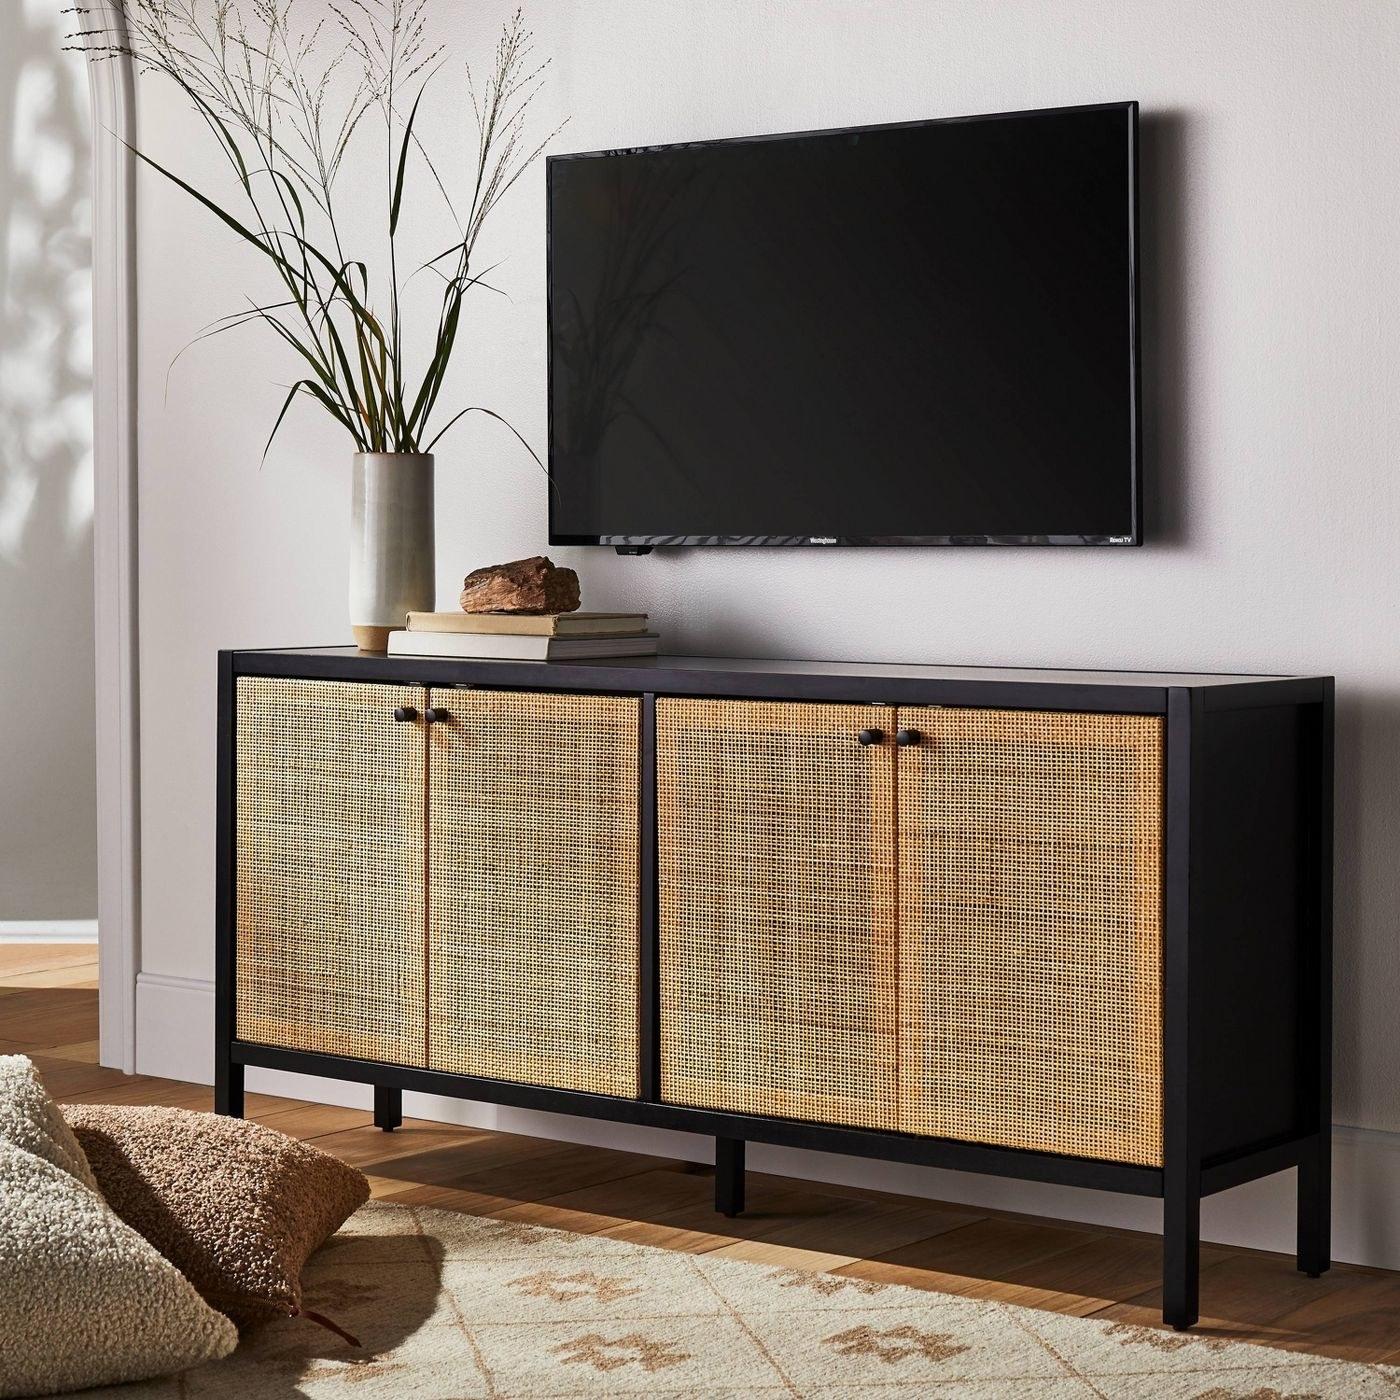 a black and cane cadenza under a TV